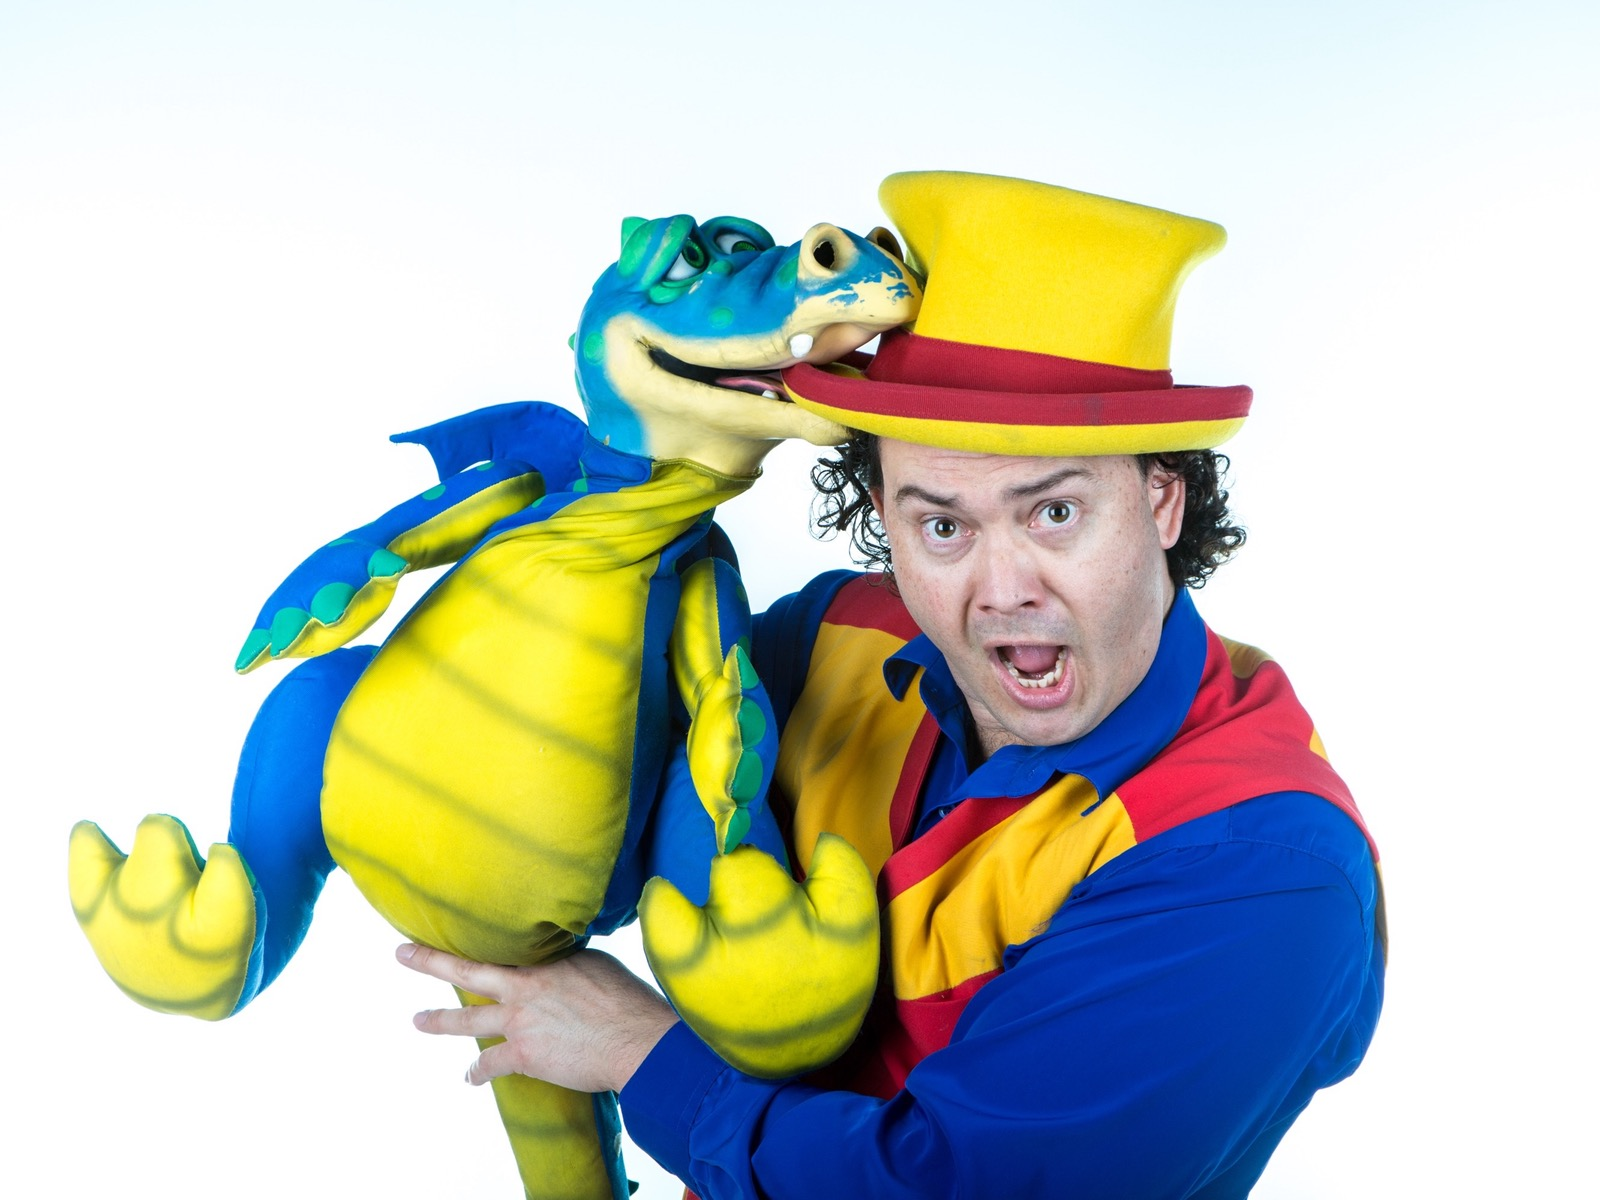 Tim Credible's Family Magic Show - School Holiday Fun - Melbourne Victoria